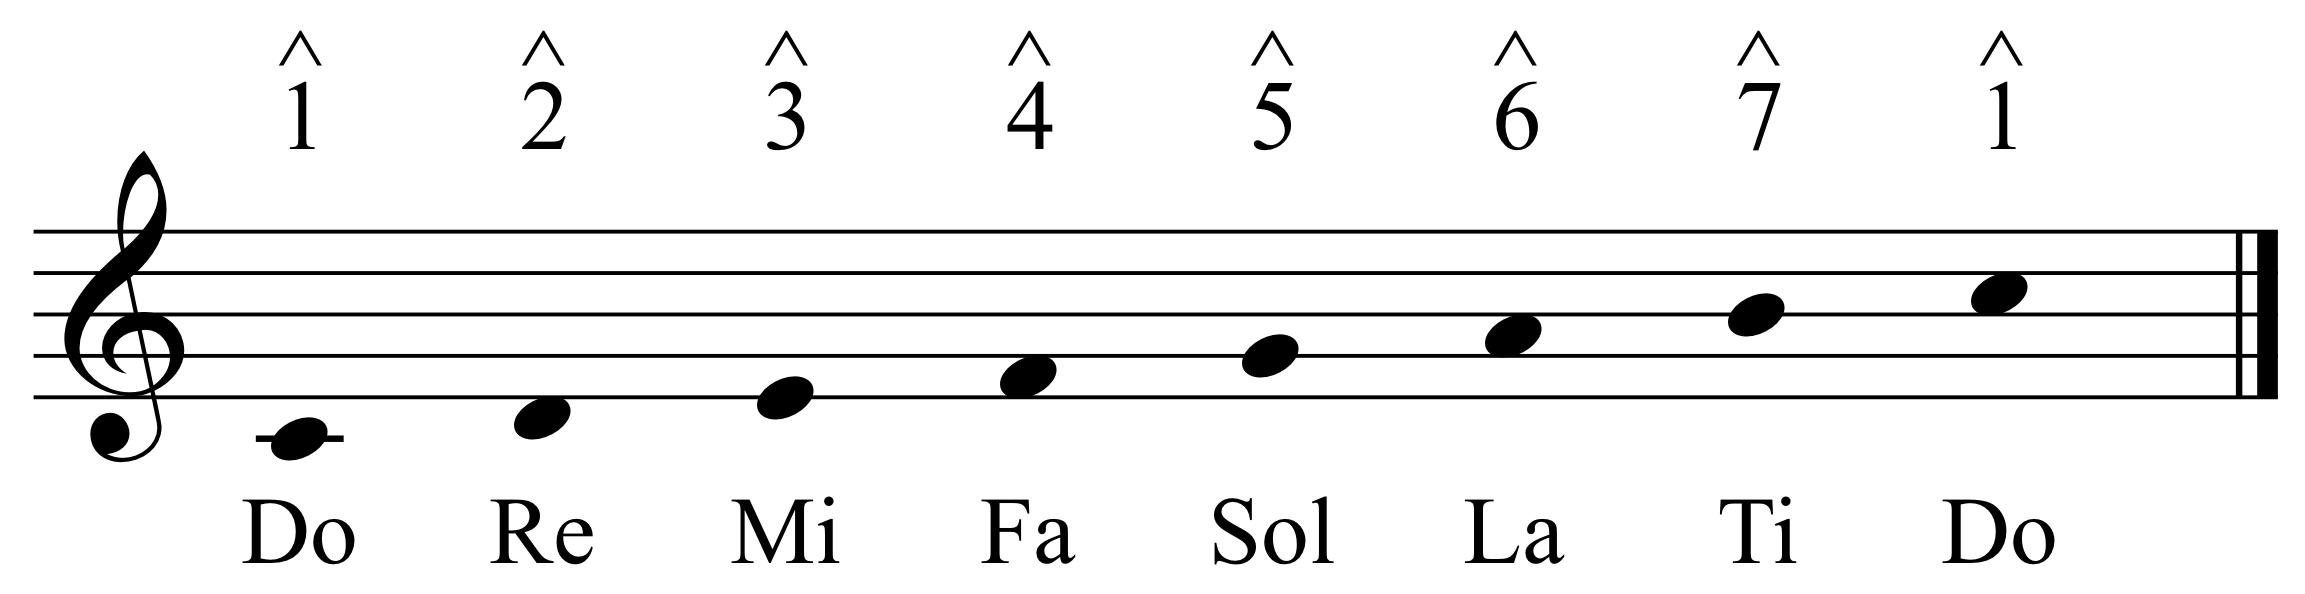 Solfege and Scale Degrees   David Kulma